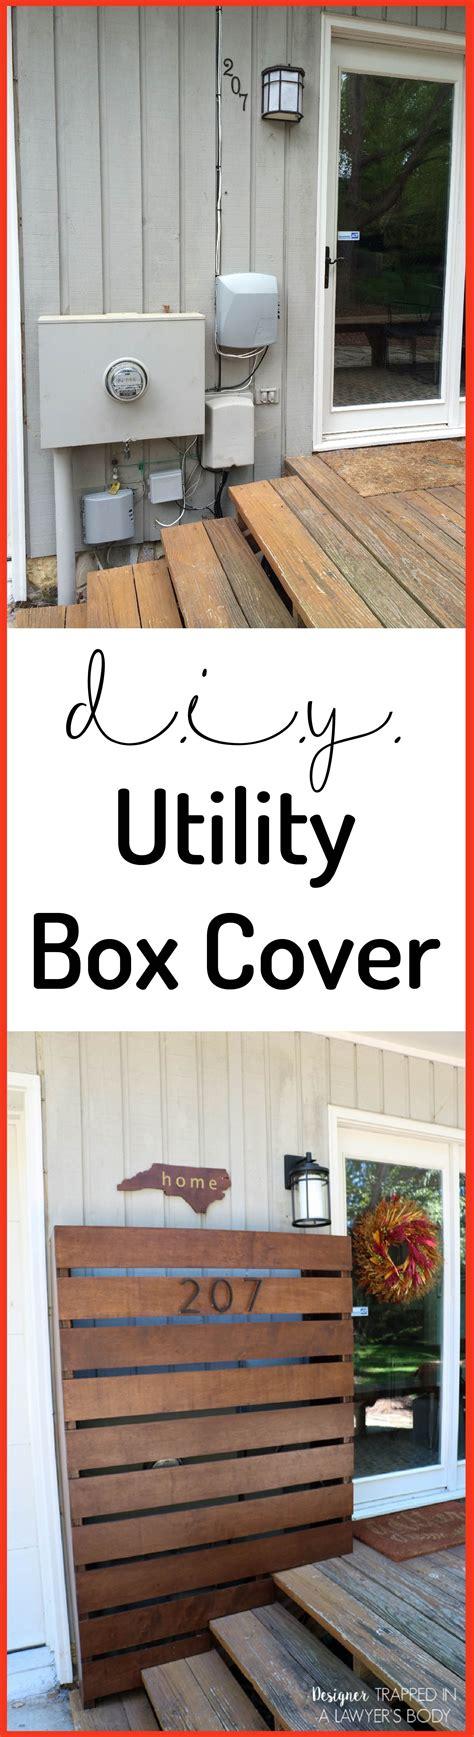 decorative utility box covers decorative utility box covers decorative design